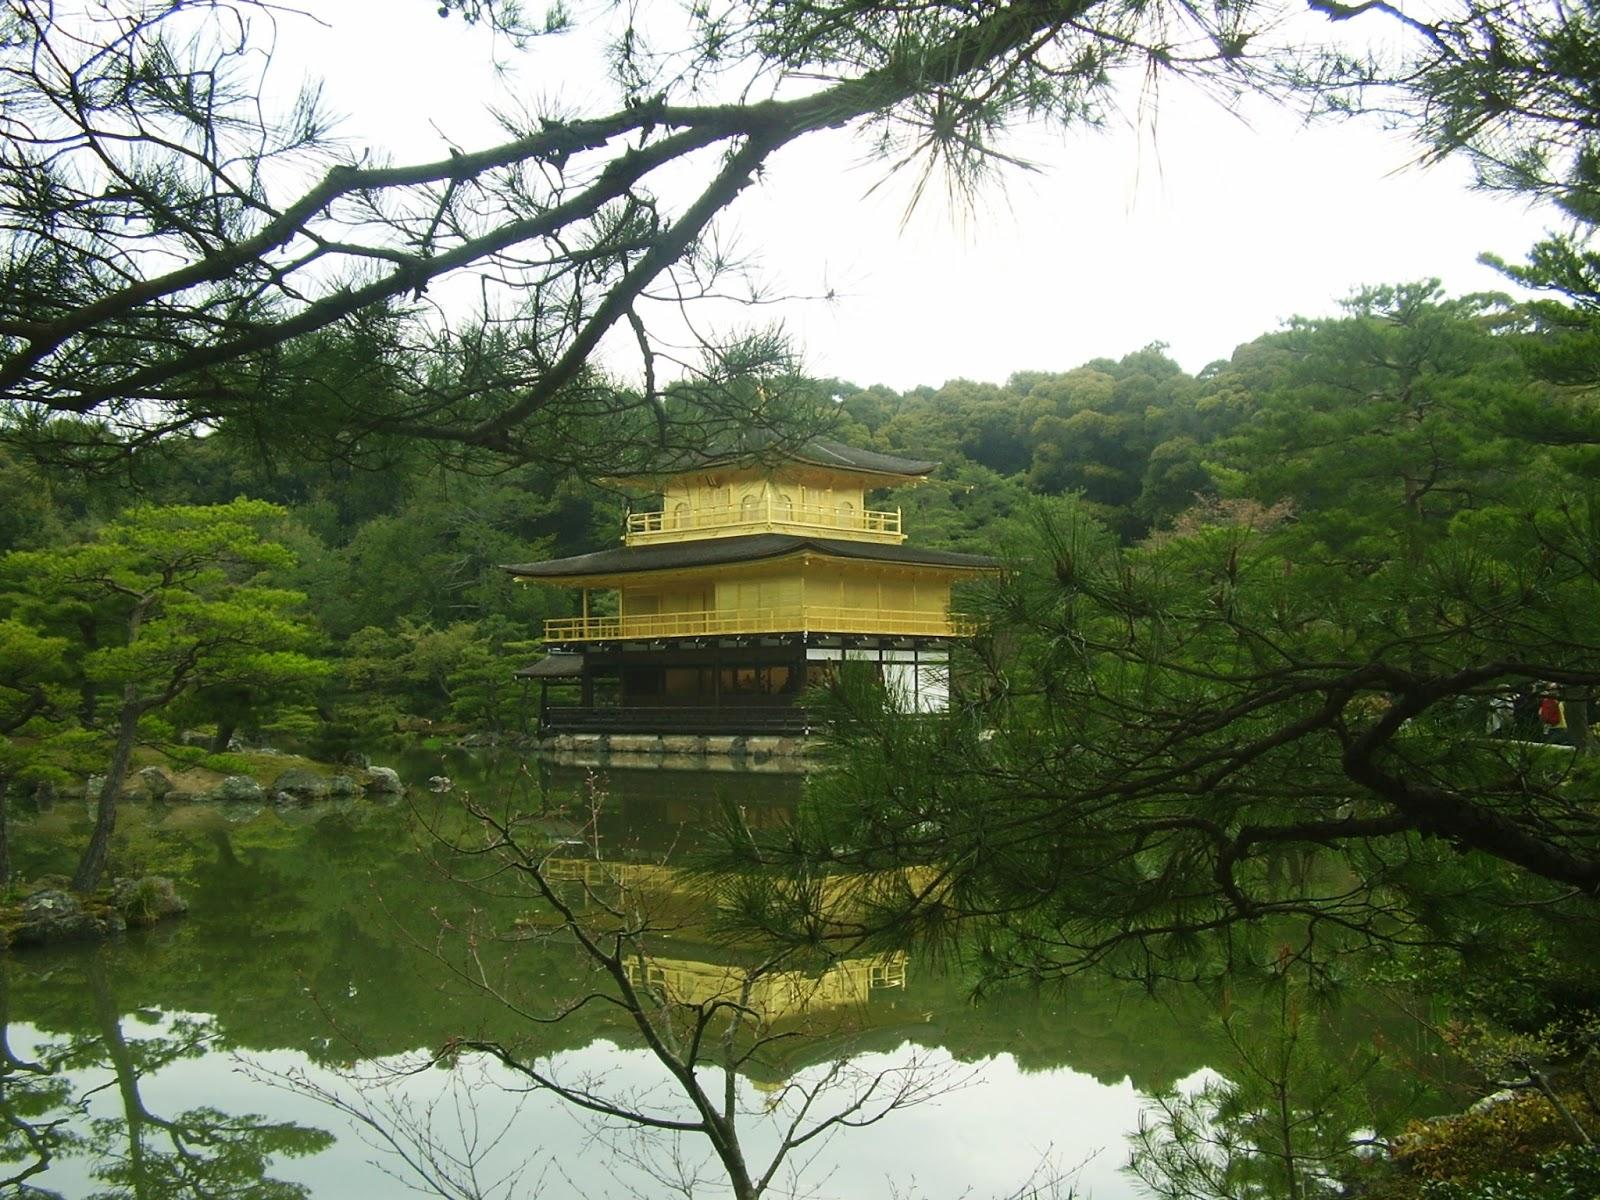 Pabellon dorado en Kioto (Kyoto), Japon